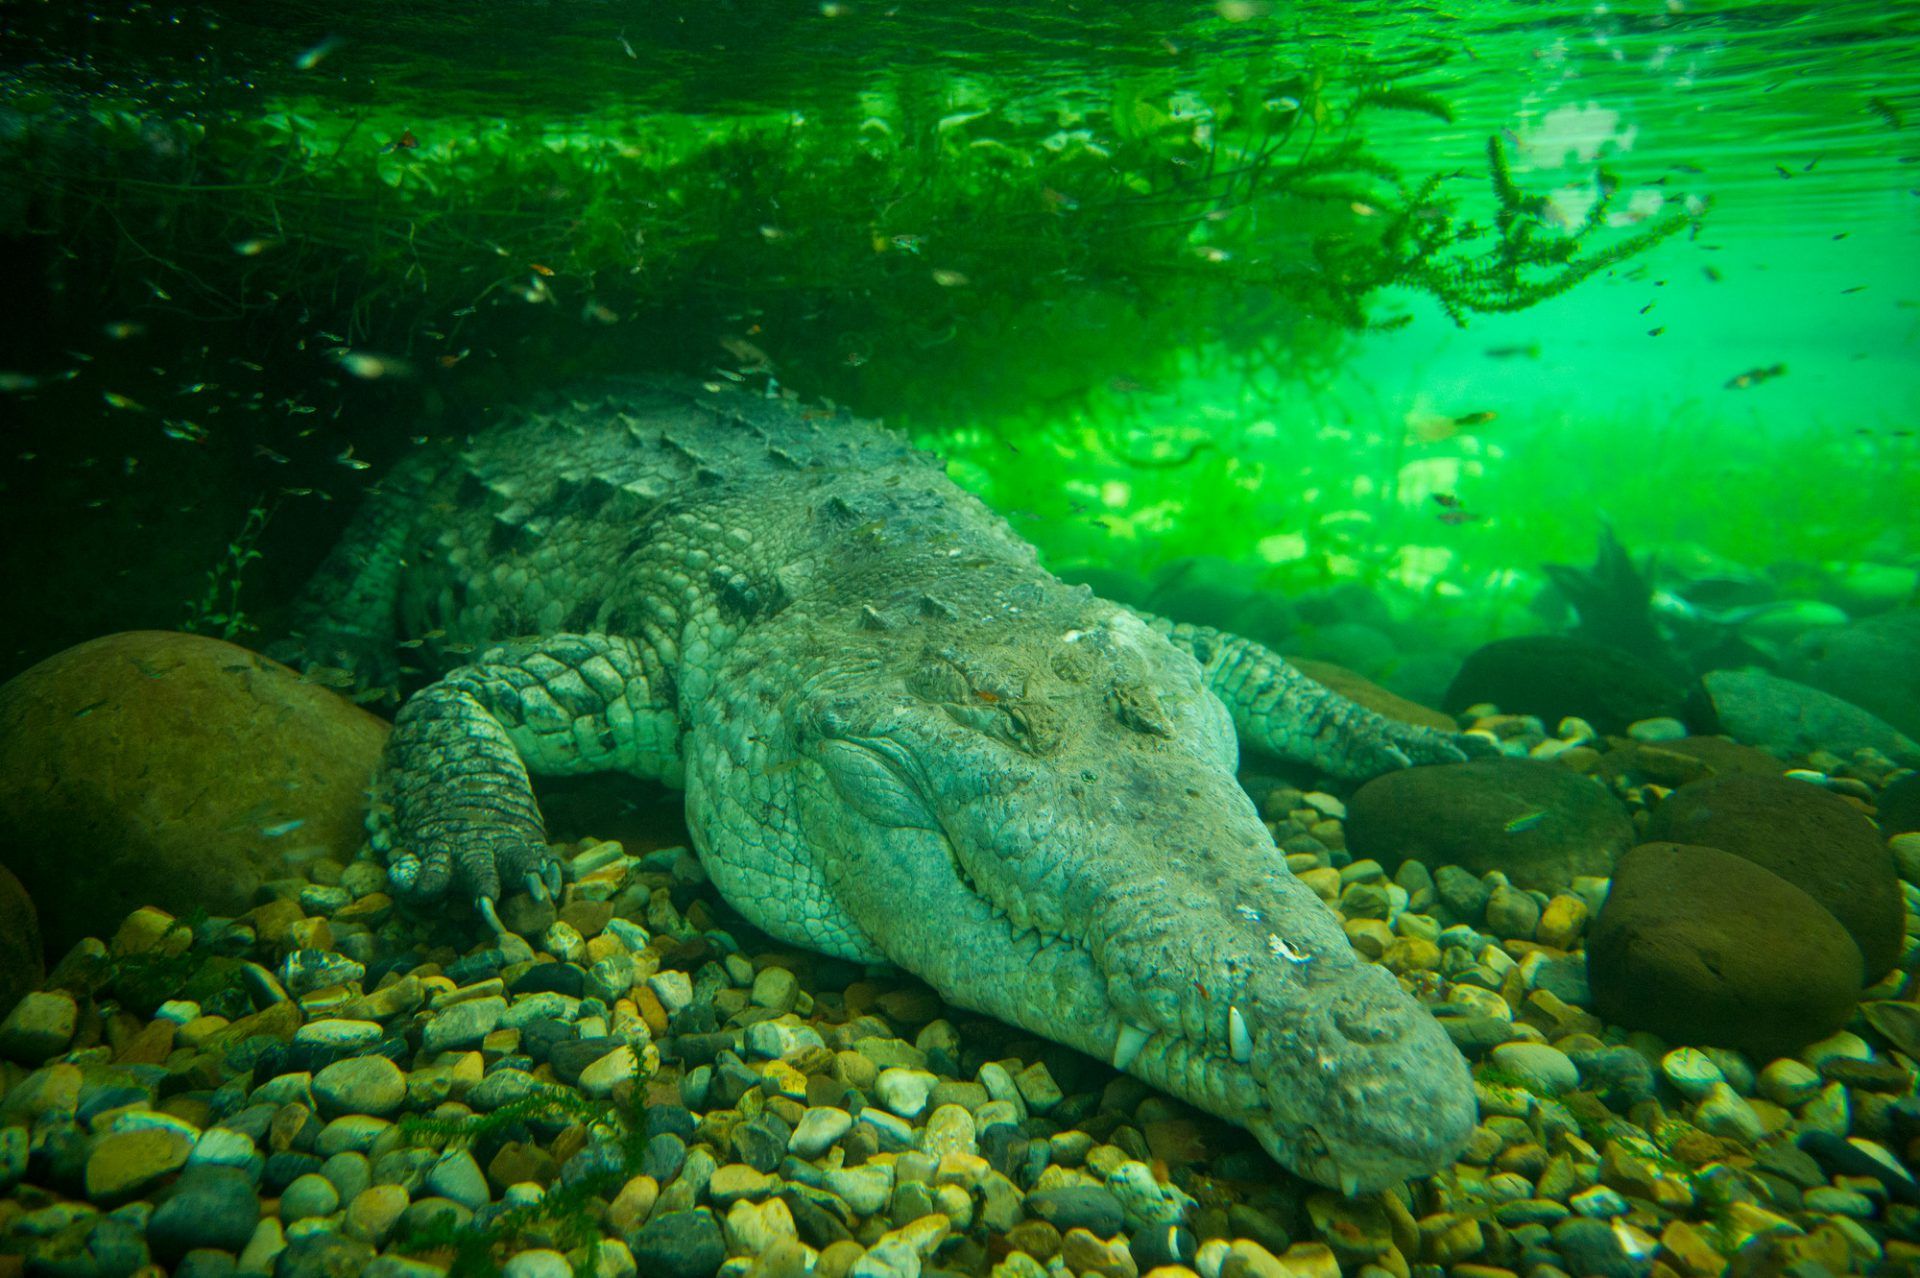 Photo: An Orinoco crocodile, Crocodiles intermedium, at the Piscilago Zoo in Colombia.